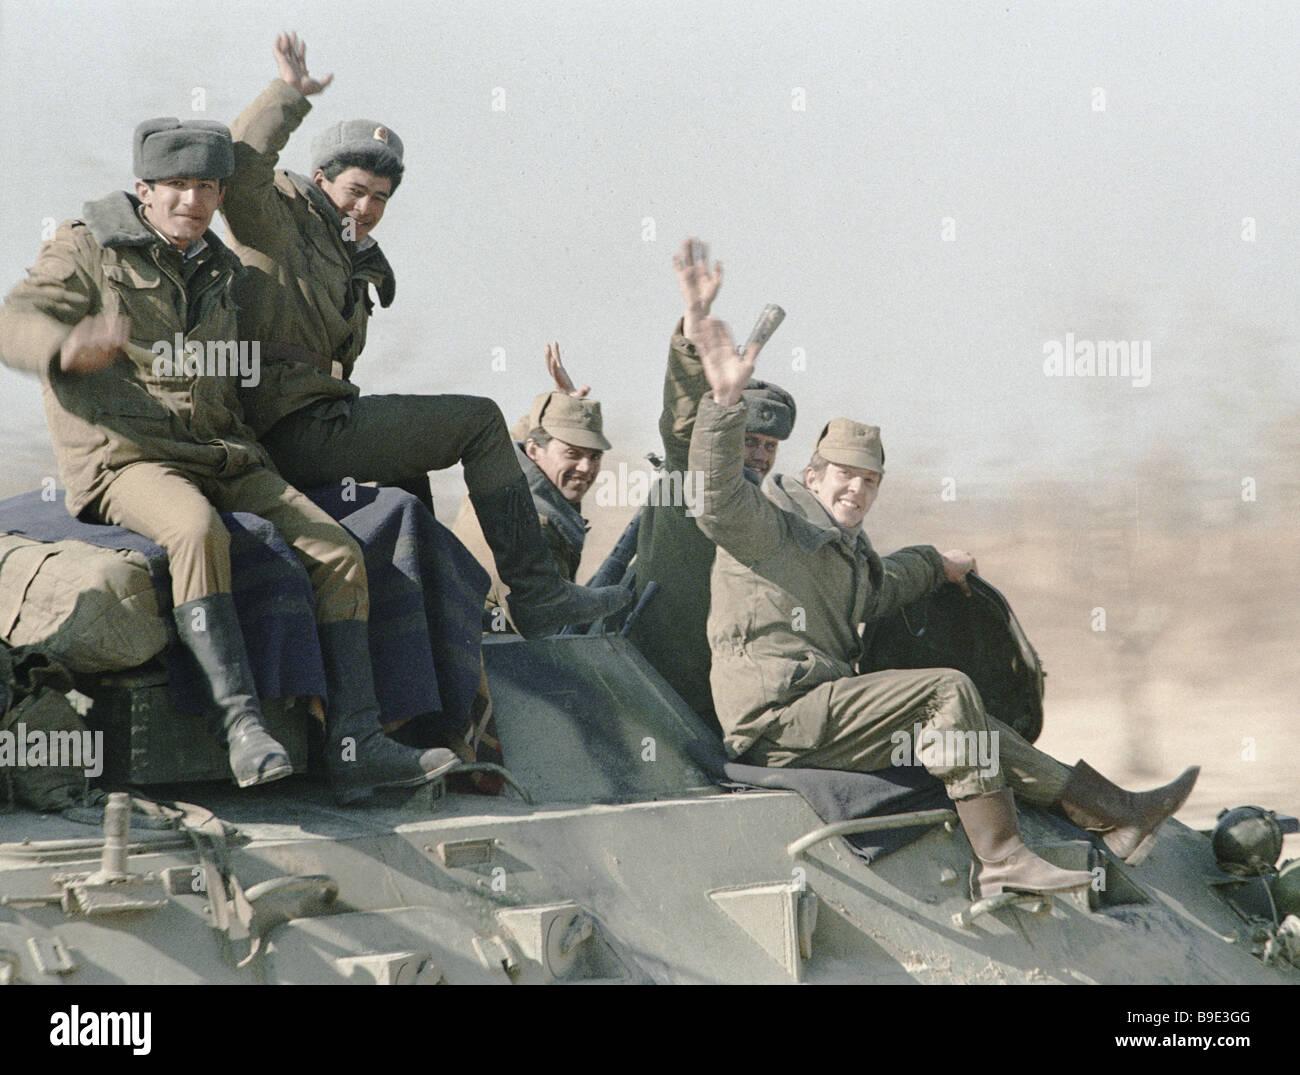 Soviet Afghanistan war - Page 6 Soviet-troops-leaving-afghanistan-B9E3GG